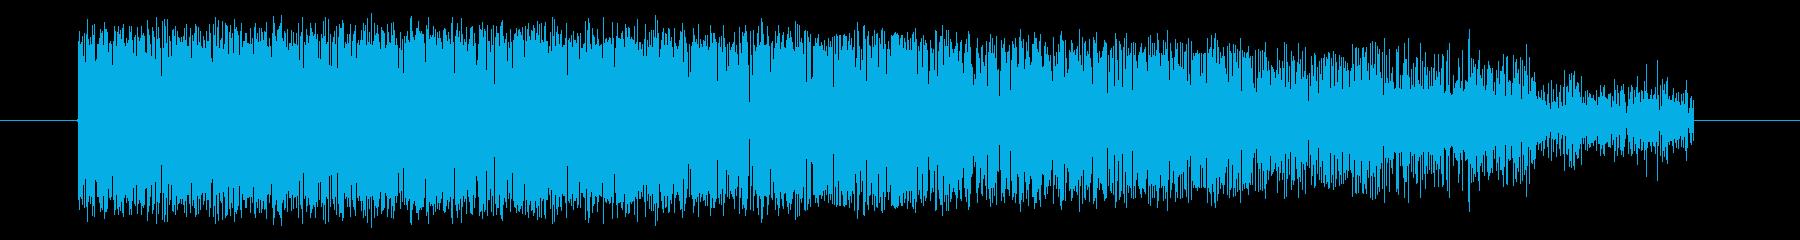 【NES 格闘01-7(歓声)】の再生済みの波形